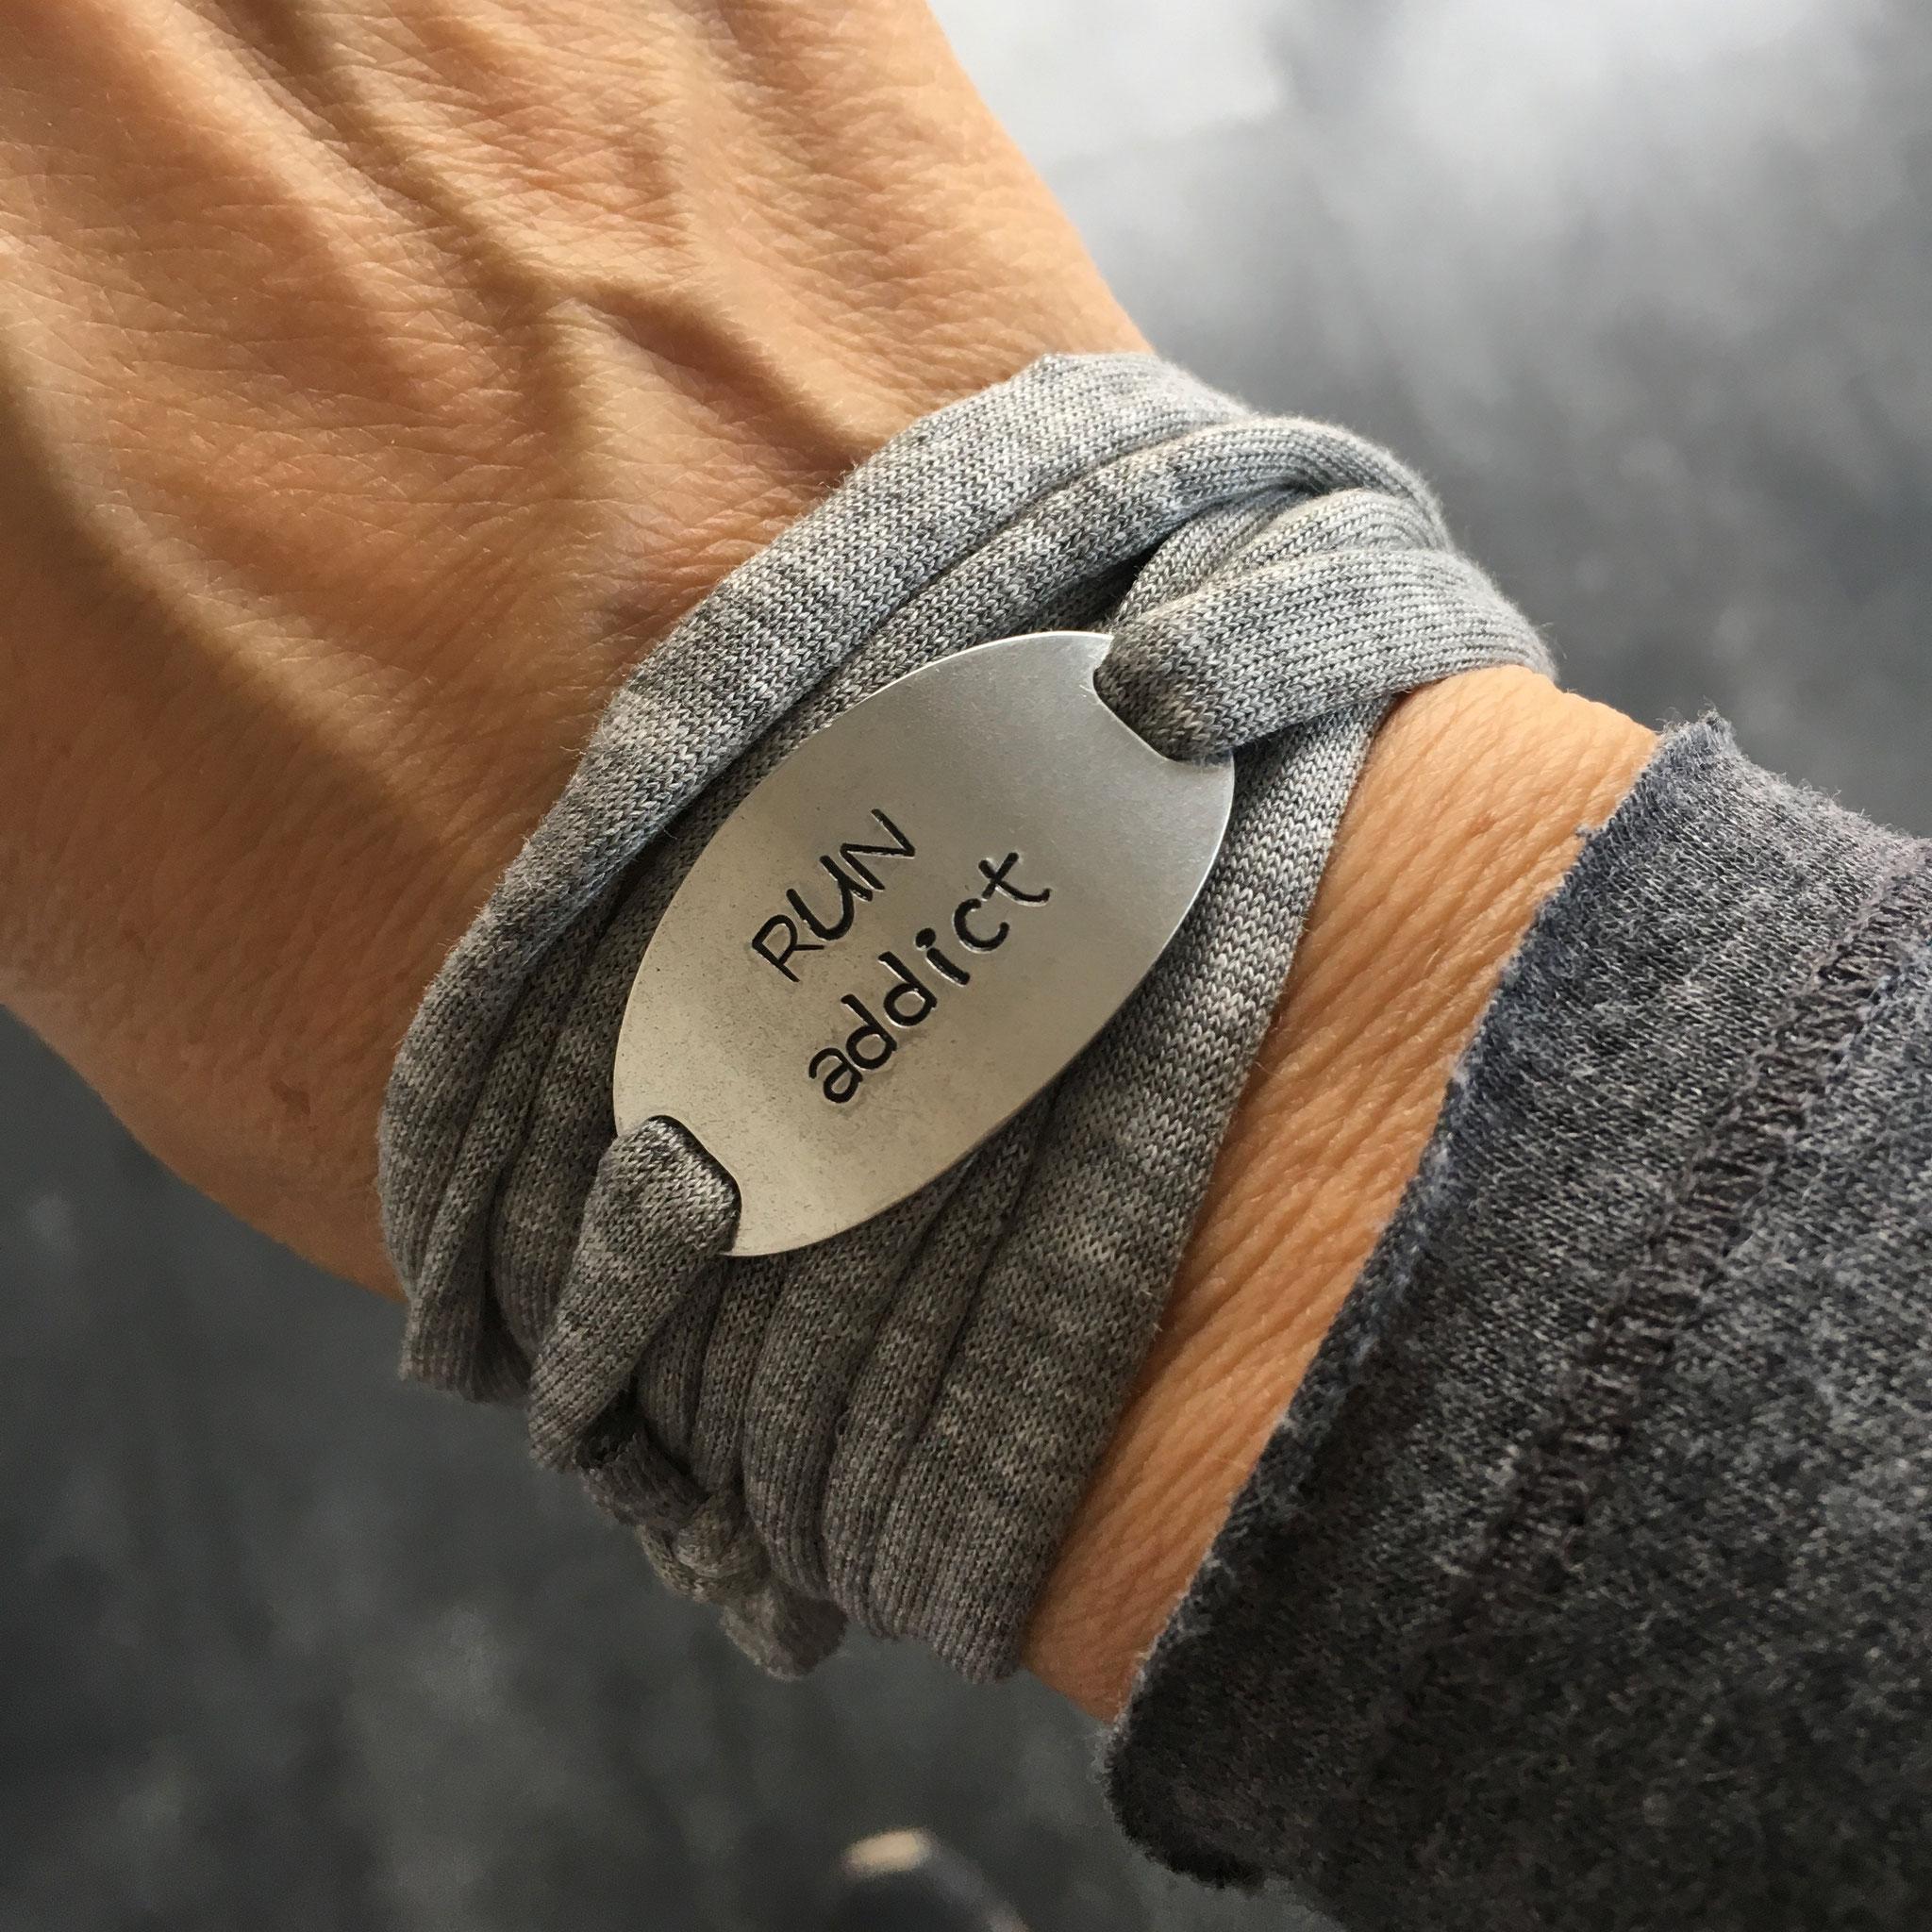 Bracelet bijoux cadeaux sport plaque métal gravée motivation running marathon fait main made in France run addict